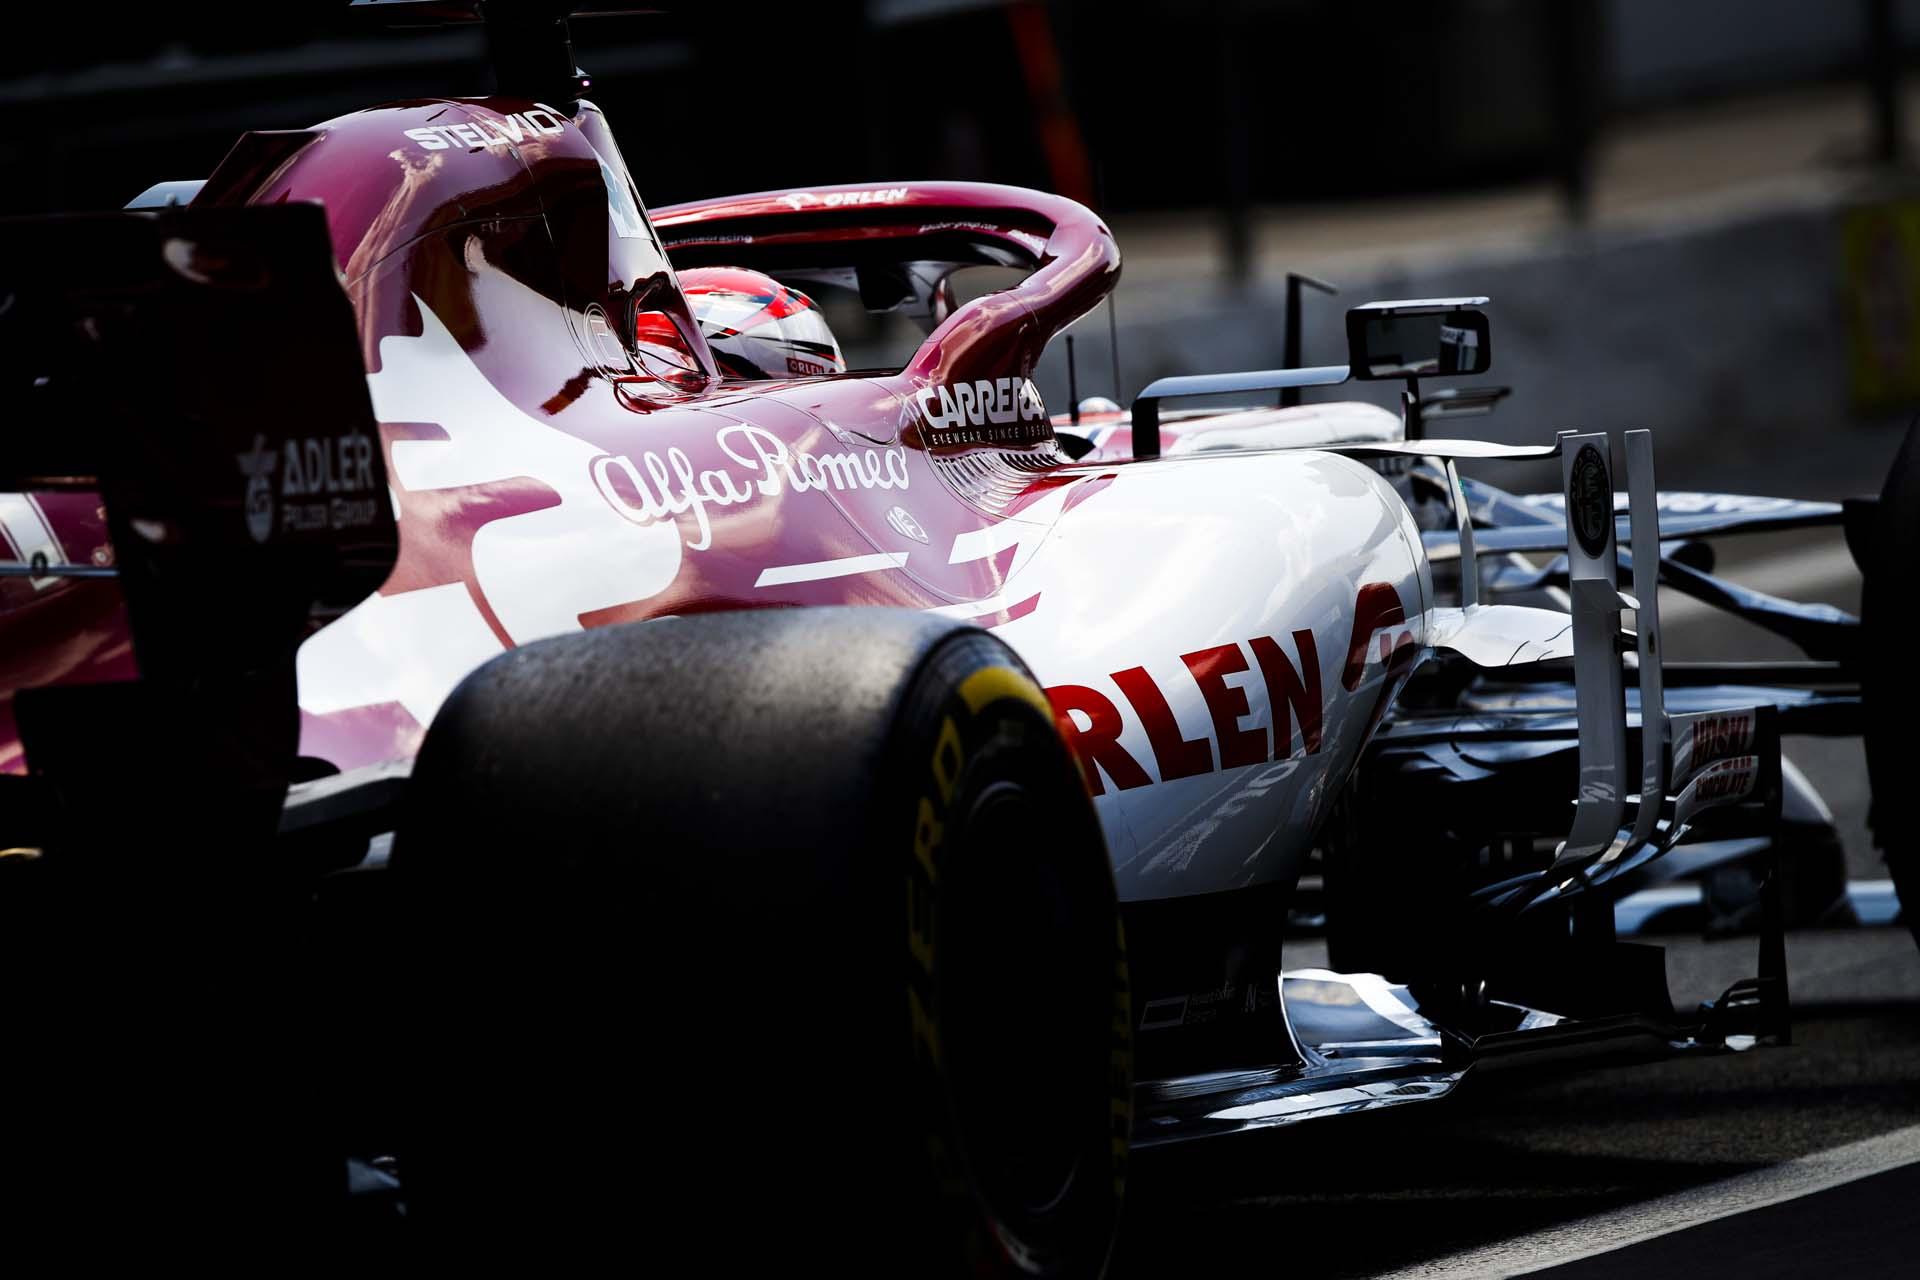 F1 - SPANISH GRAND PRIX 2020 - PART 2